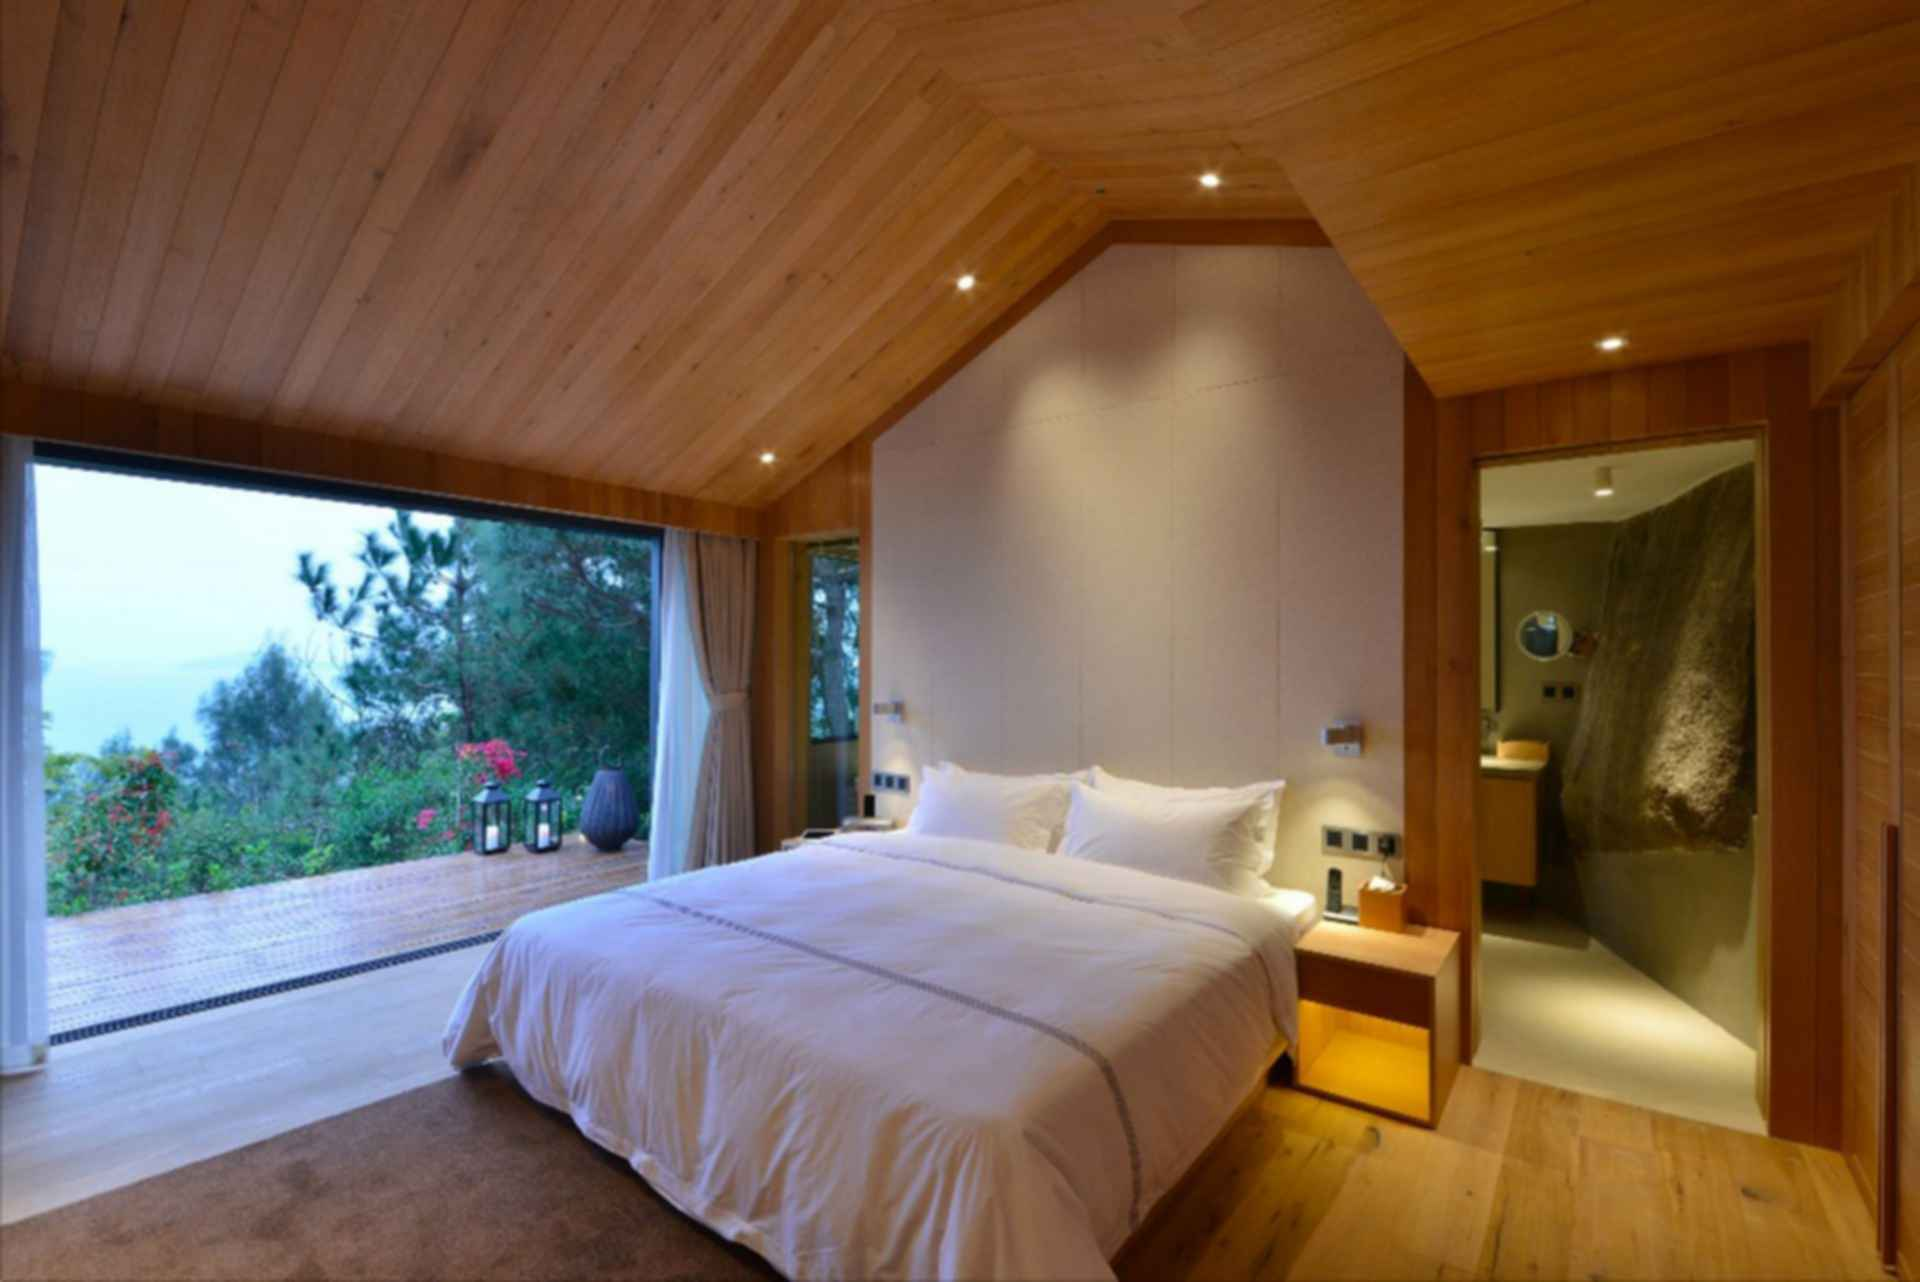 Nashare Hotel - Interior